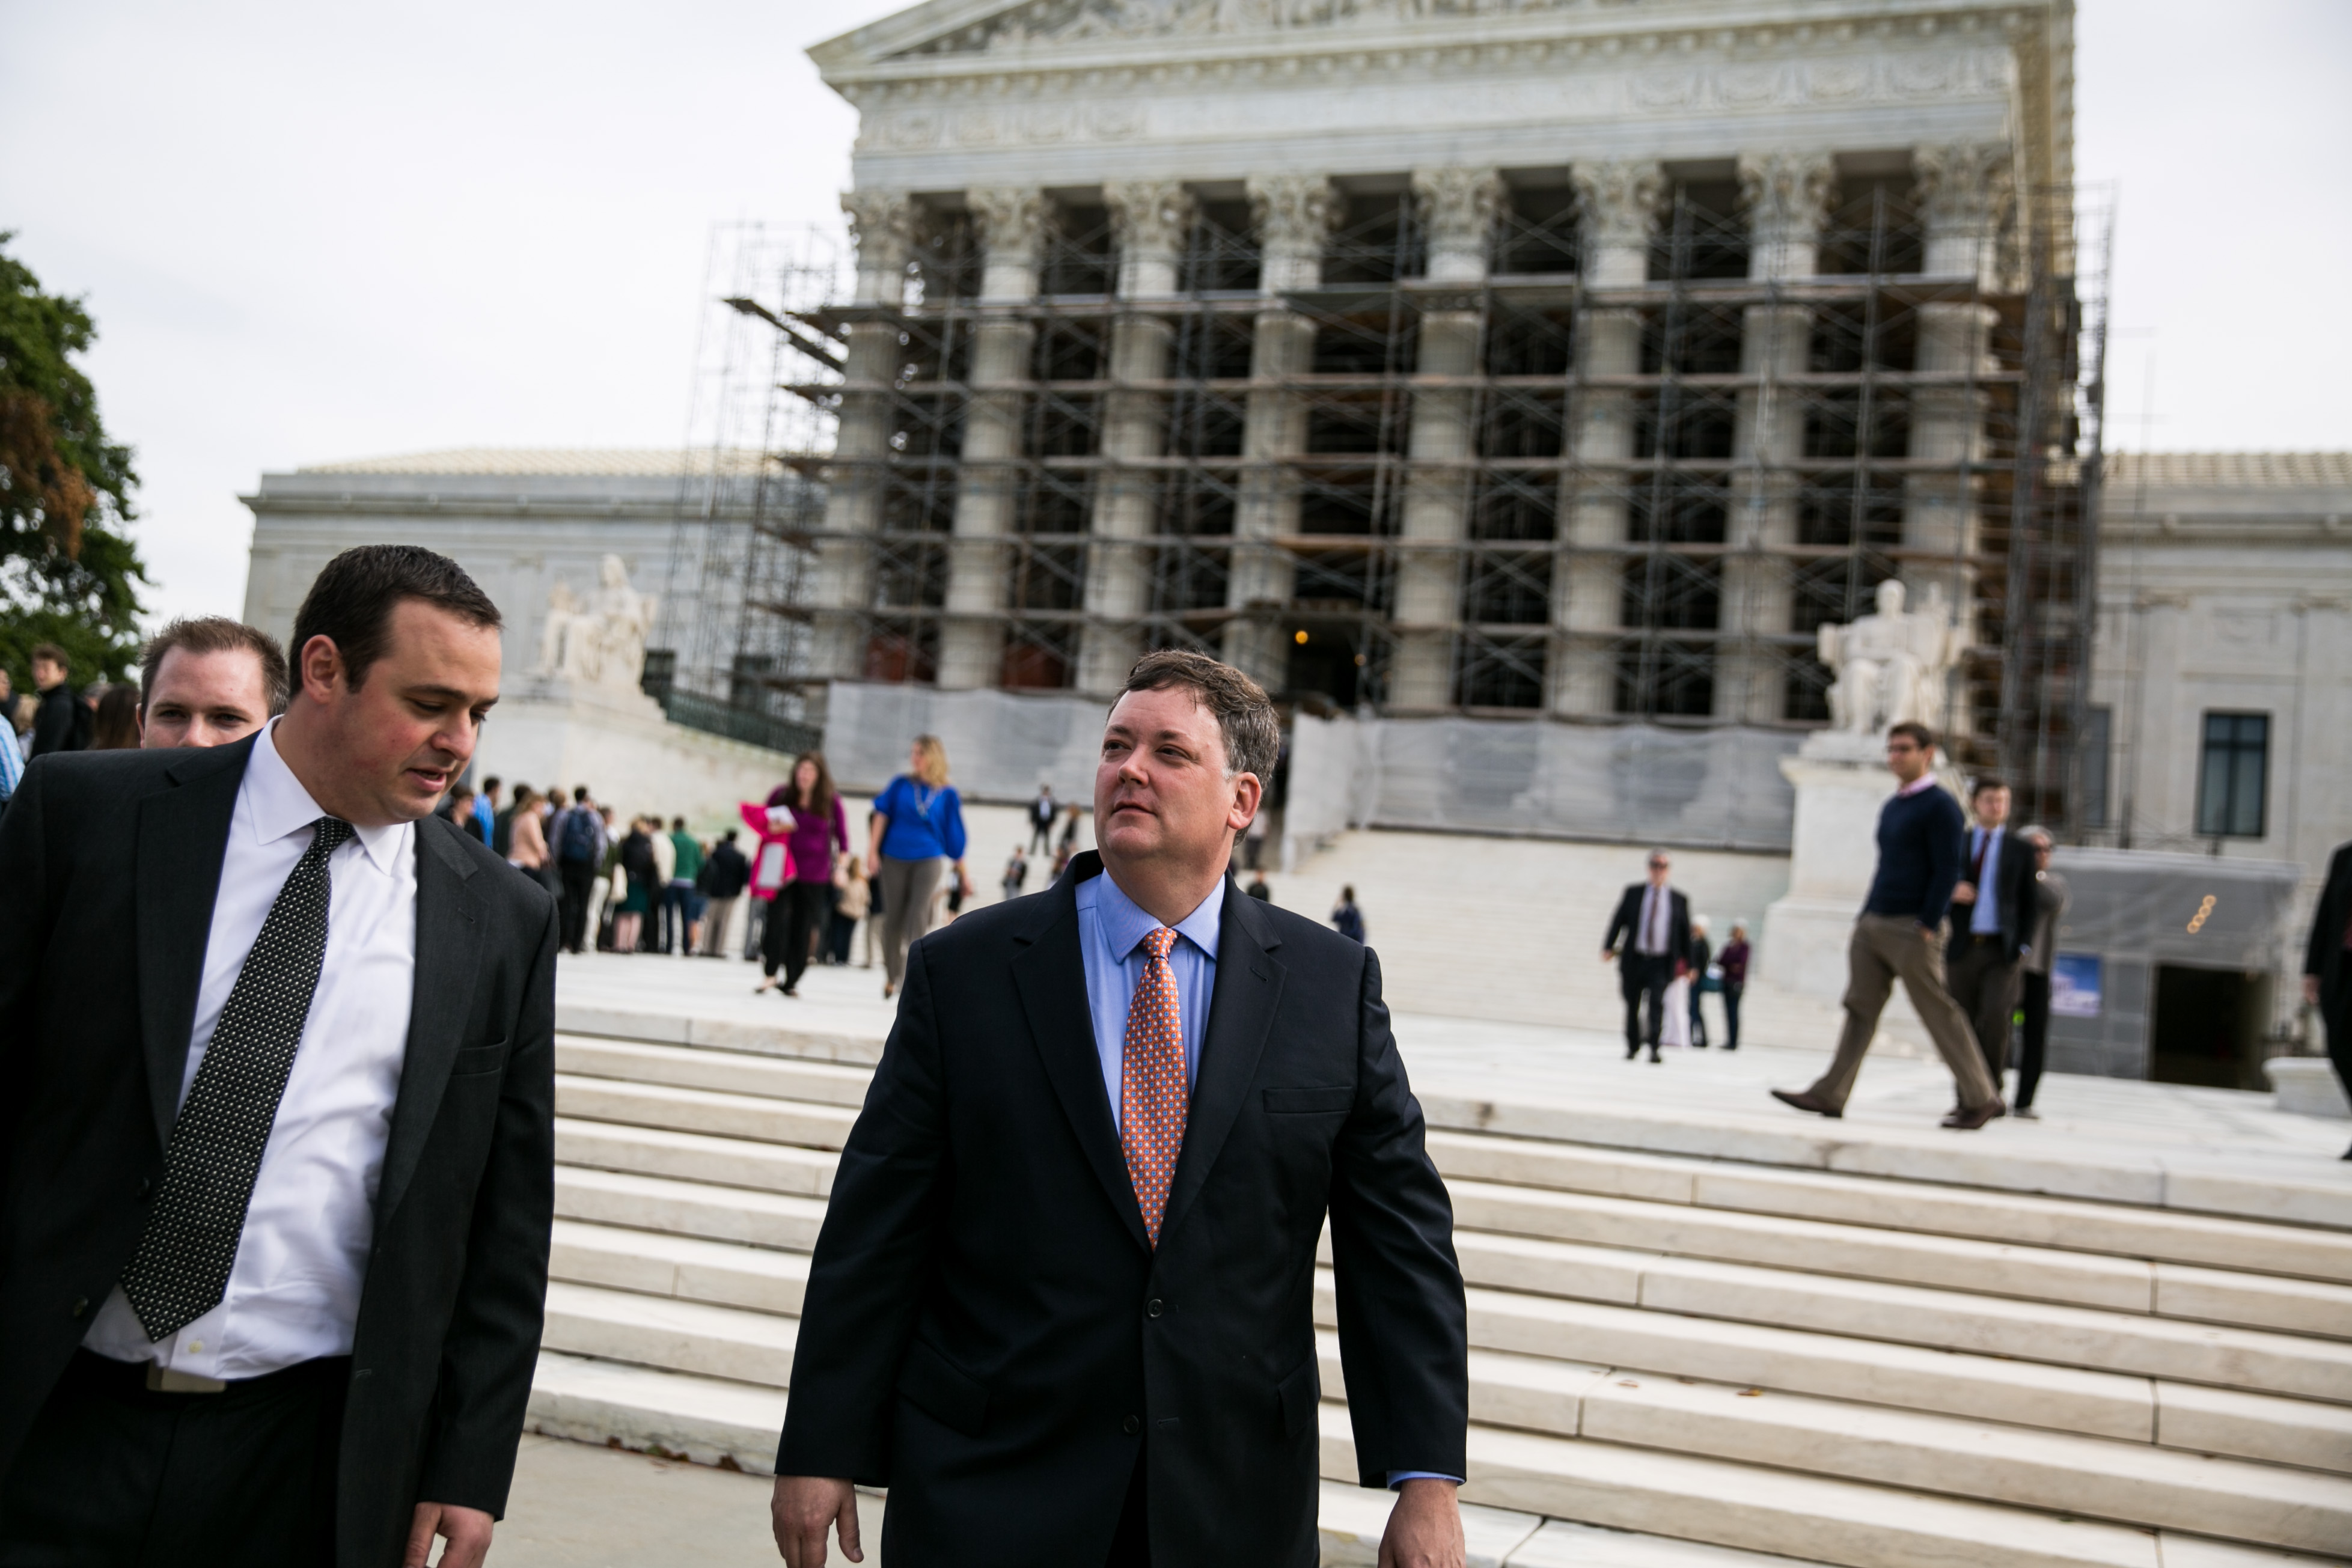 Shaun McCutcheon (R) and Dan Backer (L) at the Supreme Court in Washington, on October 8, 2013.